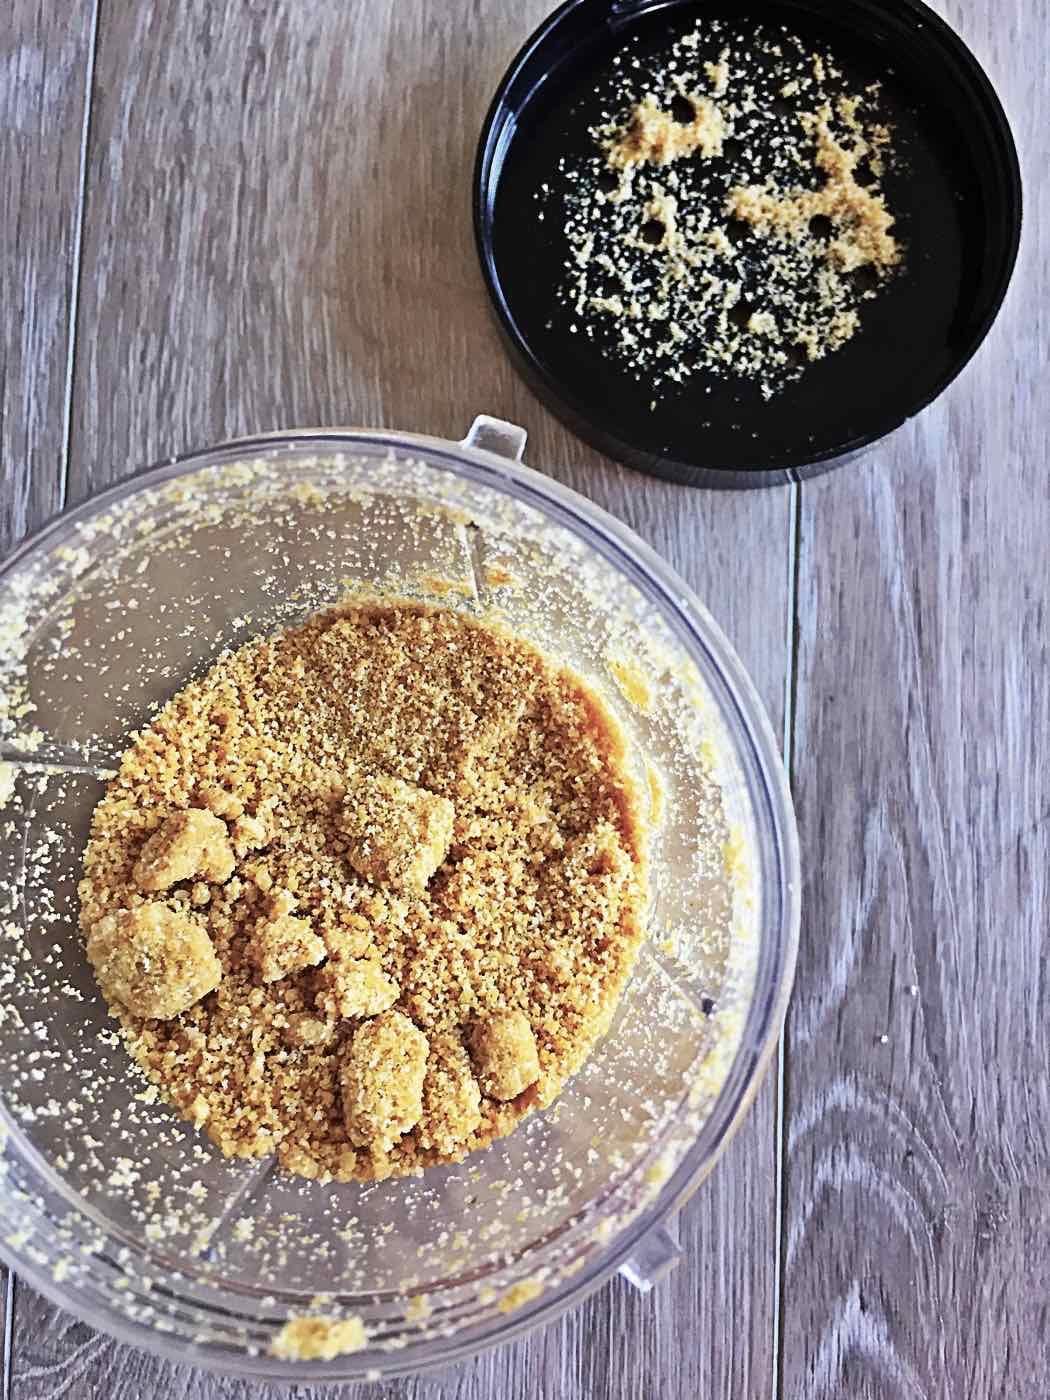 Homemade Vegan Parmesan Cheese